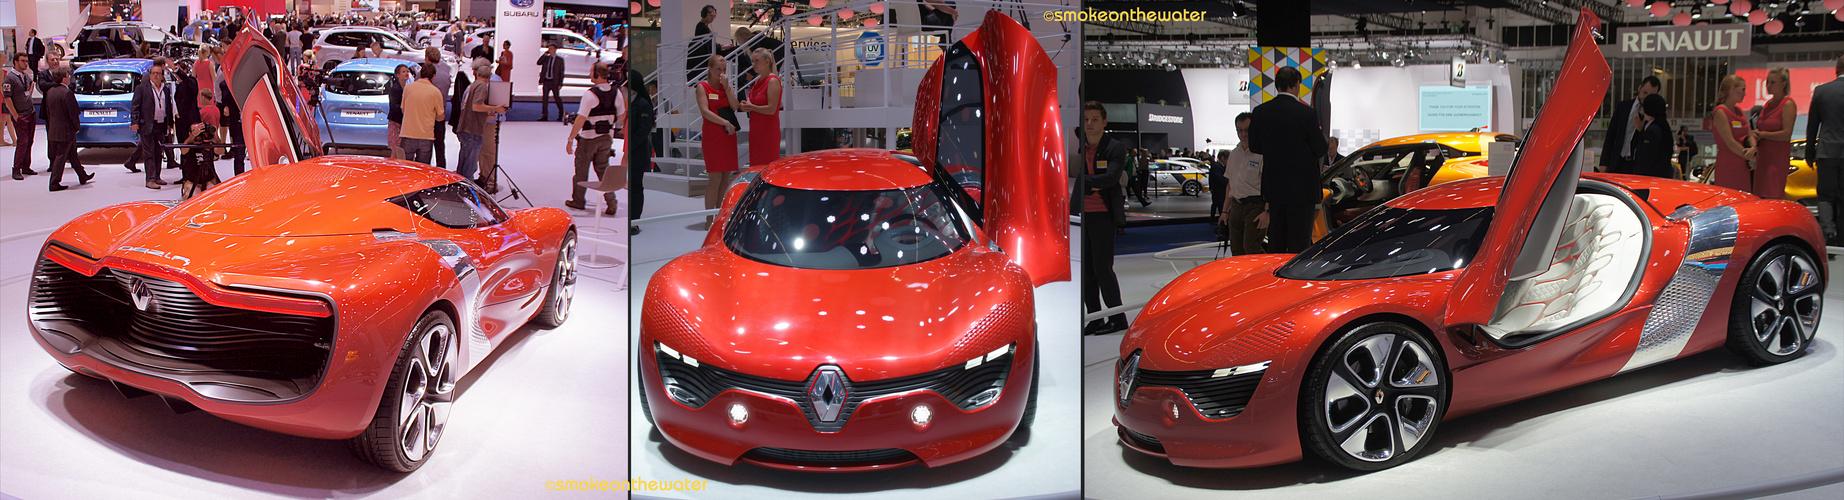 Renault DeZir Electro Concept